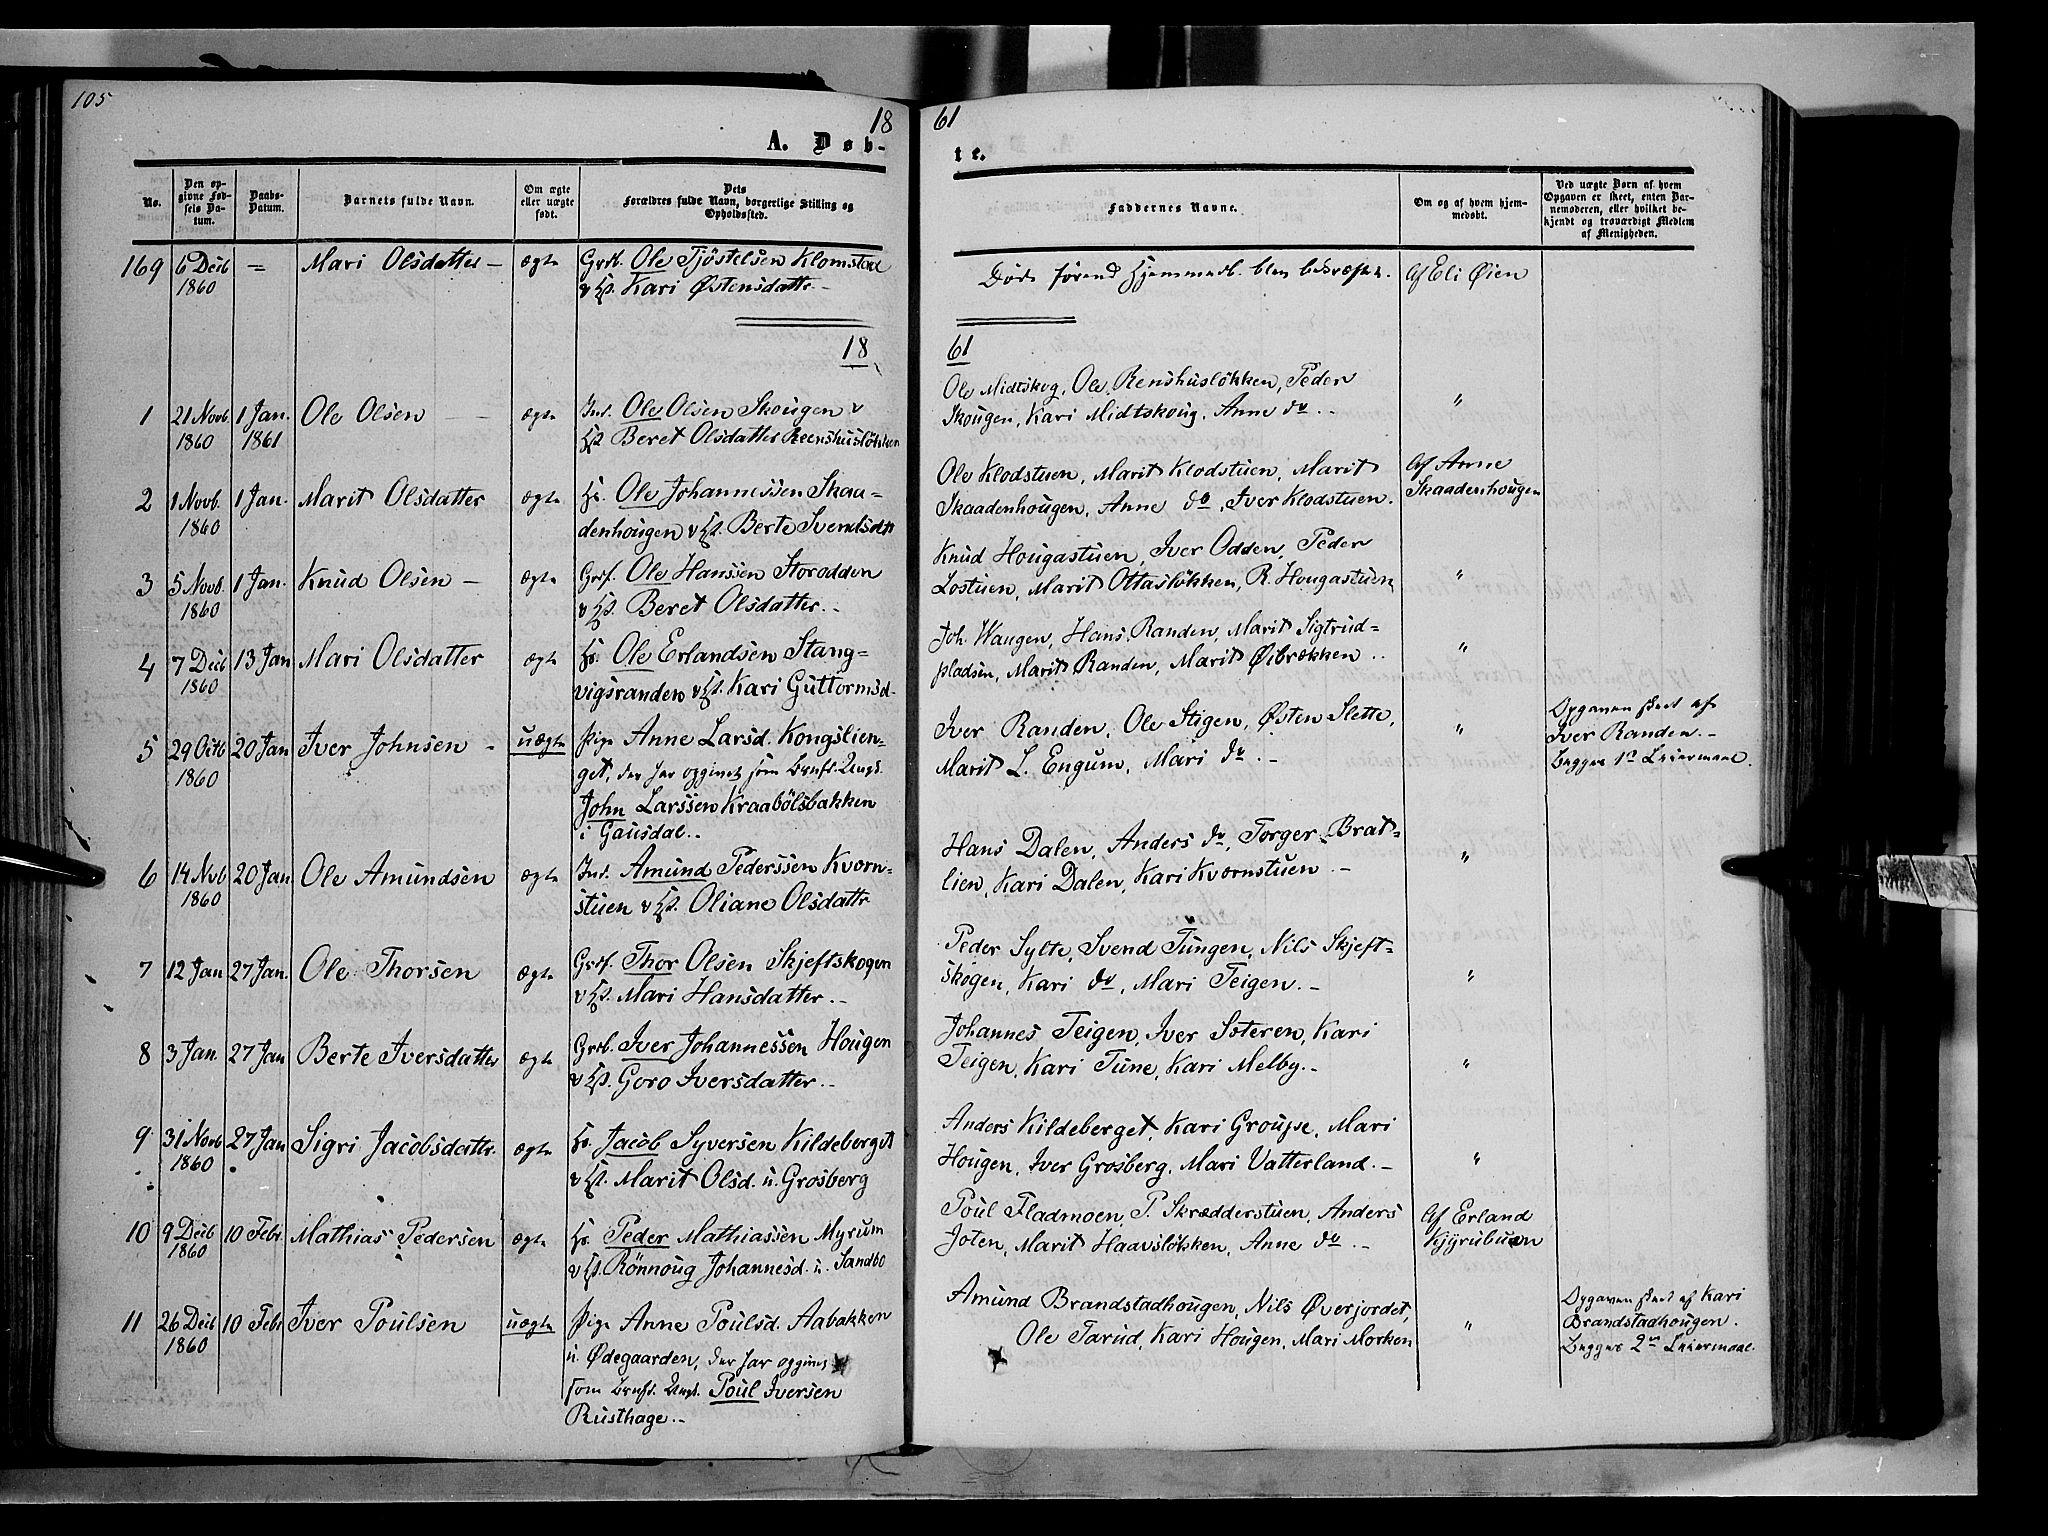 SAH, Nord-Fron prestekontor, Ministerialbok nr. 1, 1851-1864, s. 105